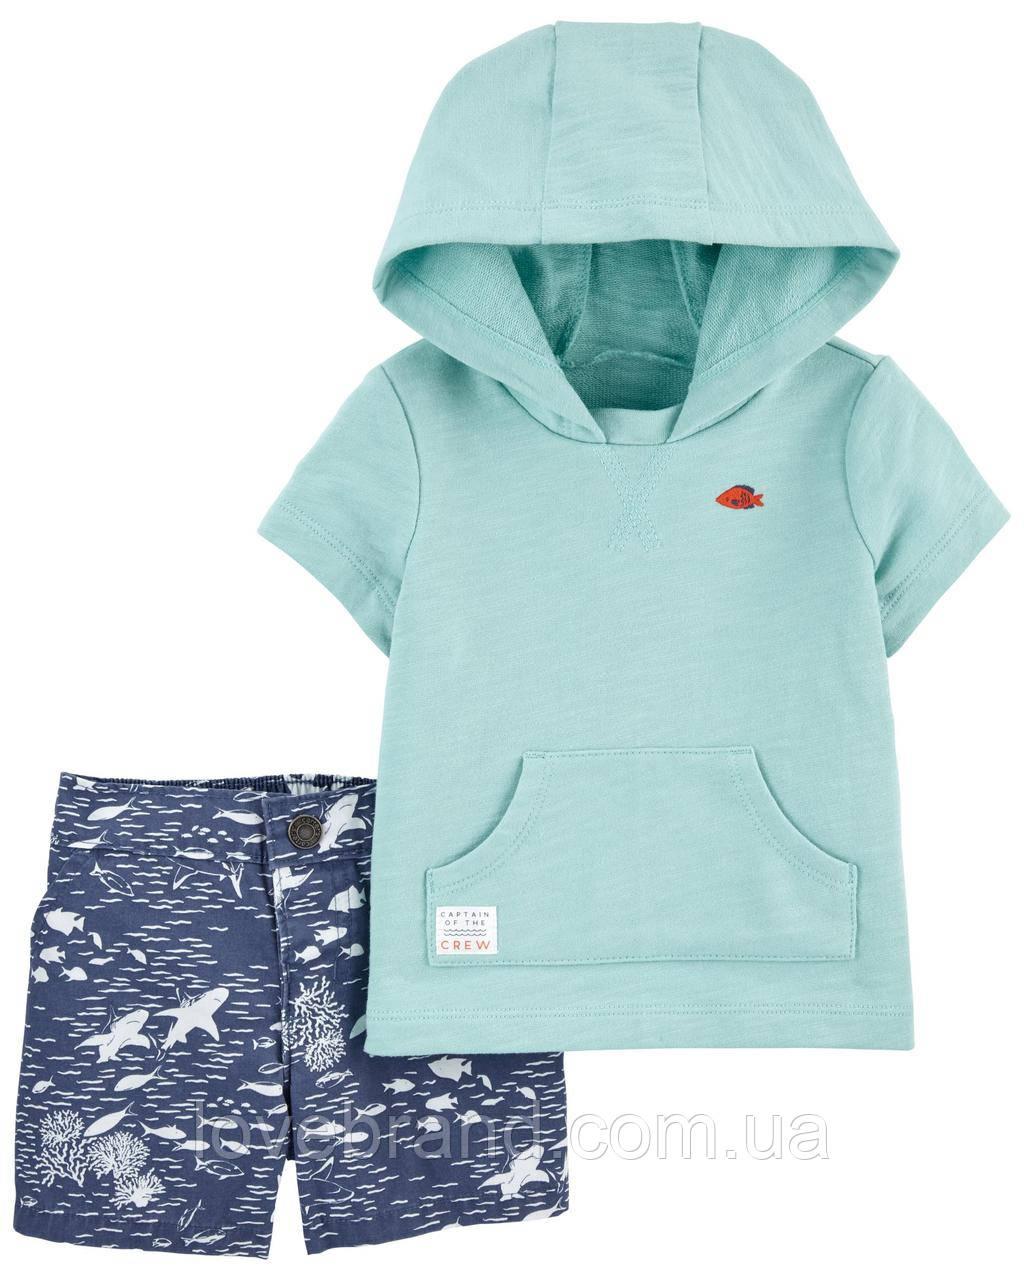 "Летний костюм картерс для малыша мальчика ""Море"" Carter's"